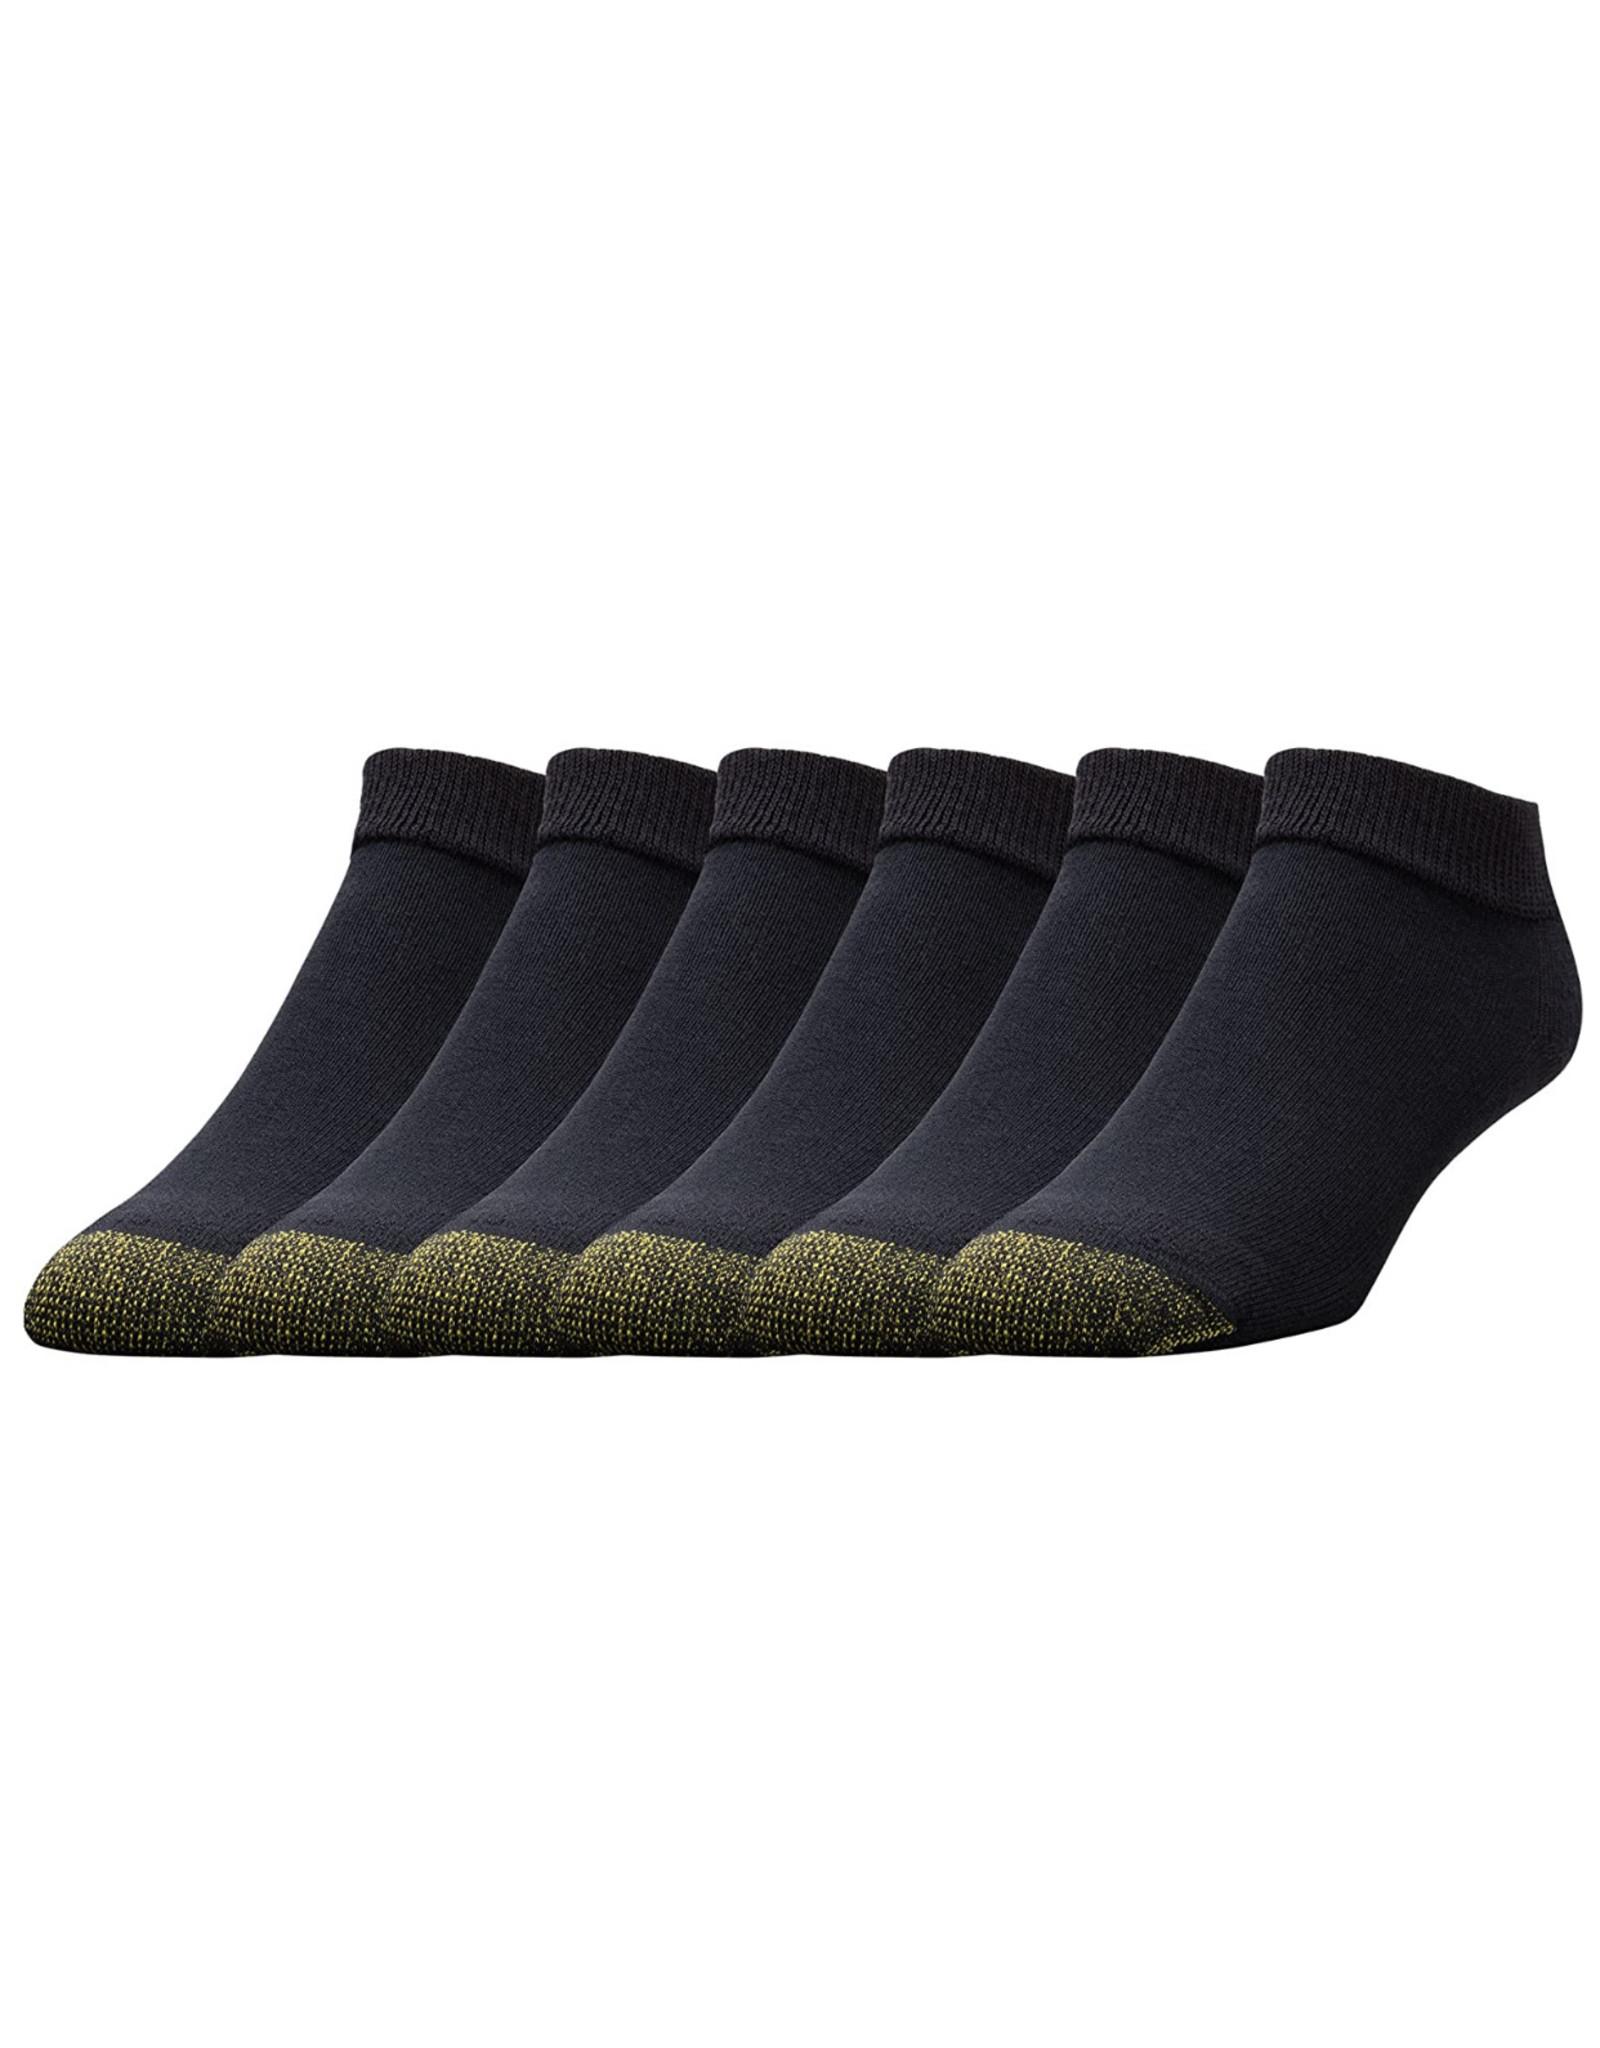 Goldtoe Goldtoe Men's Cotton Athletic Low Cut Socks 6-Pack